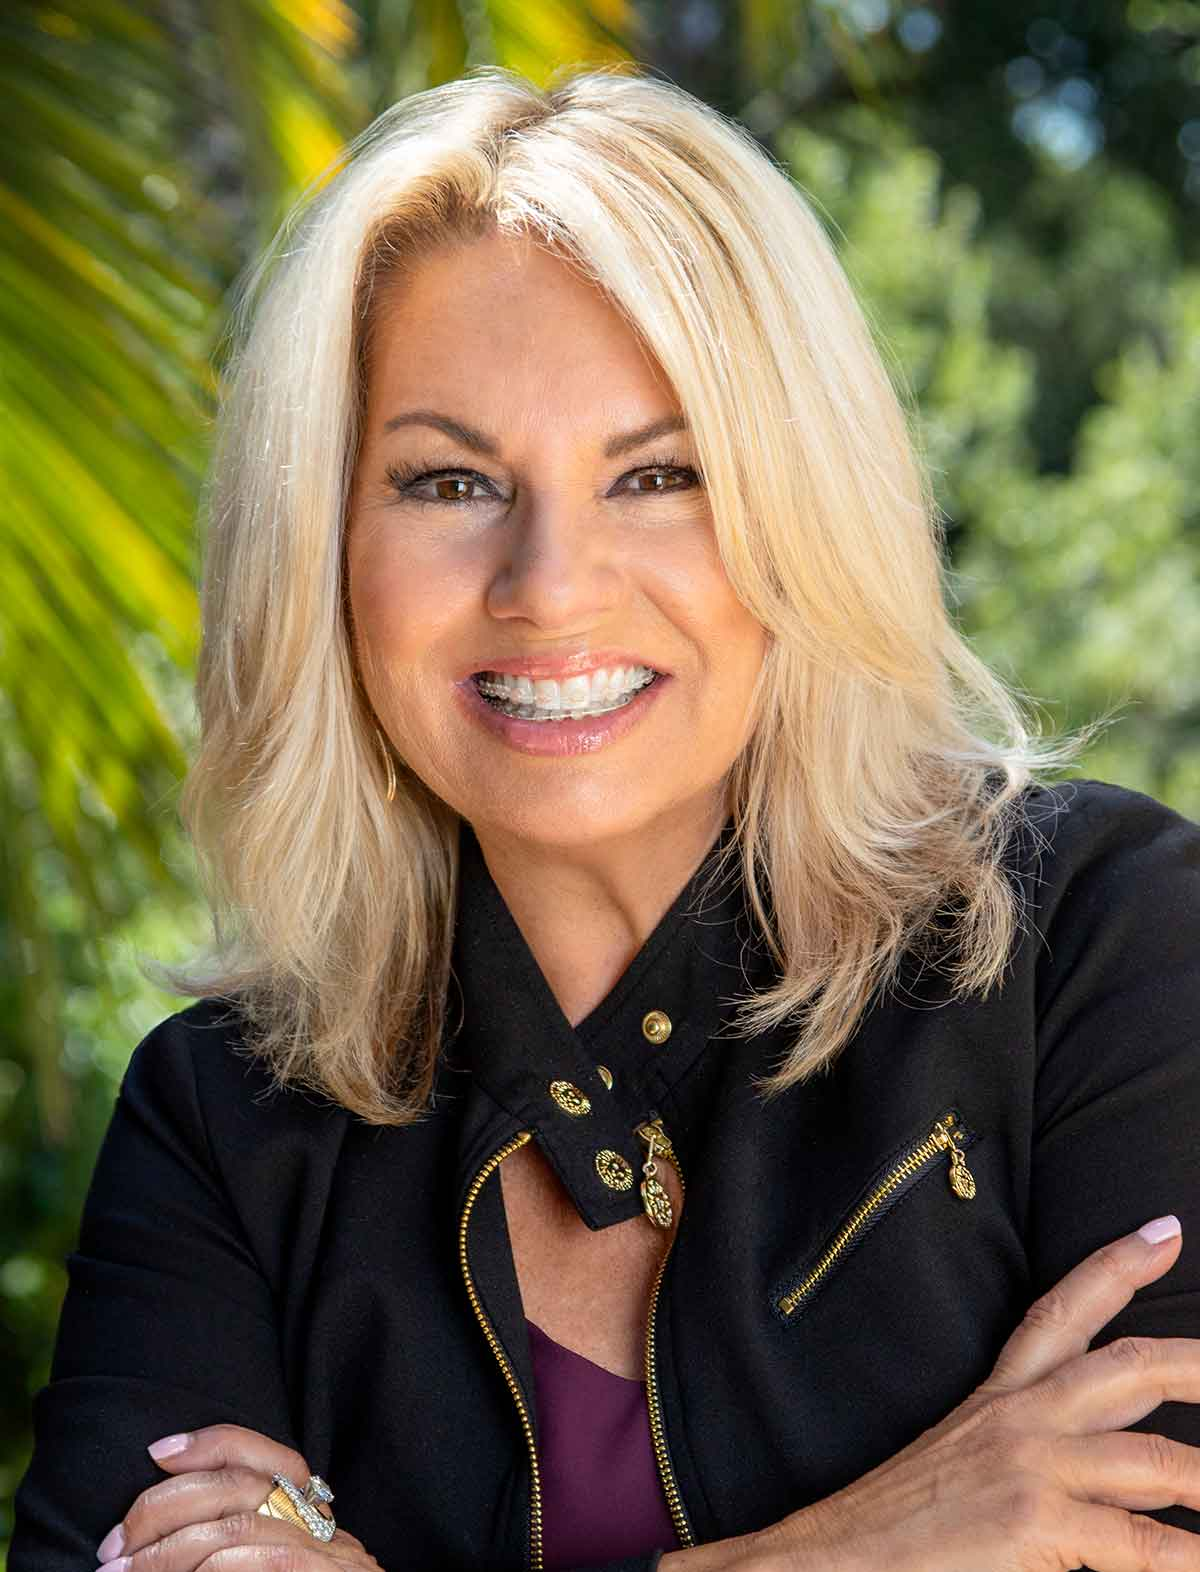 Susan-Polk-Insurance-San-Luis-Obispo-headshot-Stacy